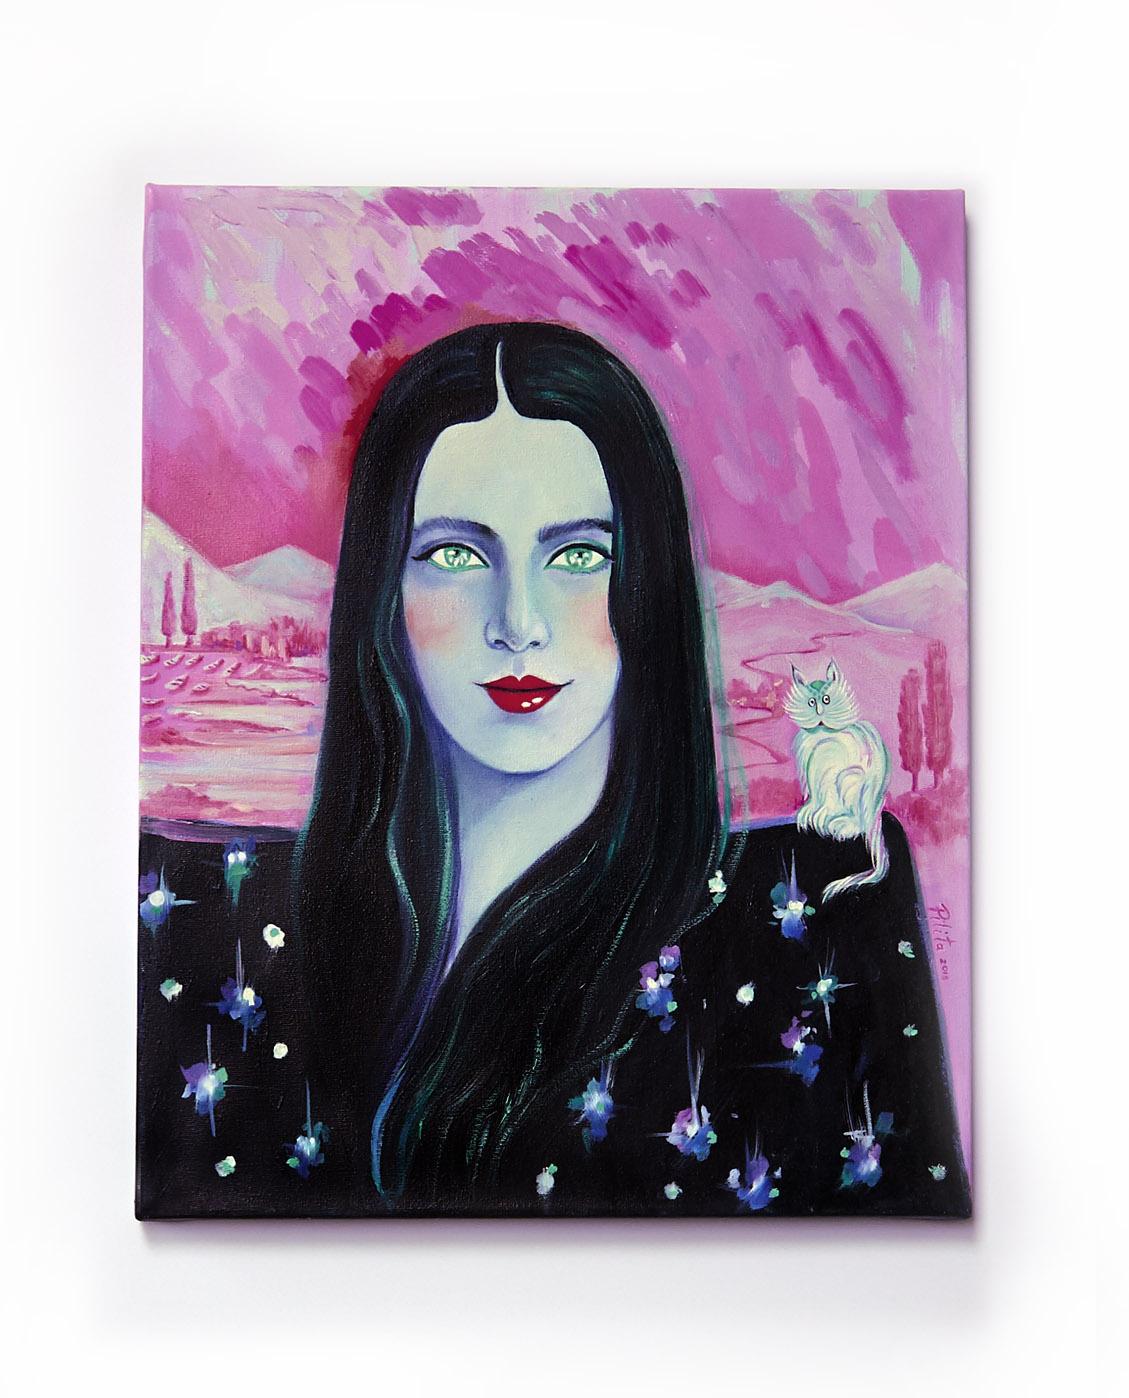 valeria, oil on canvas, 16 x 20 in. 2013